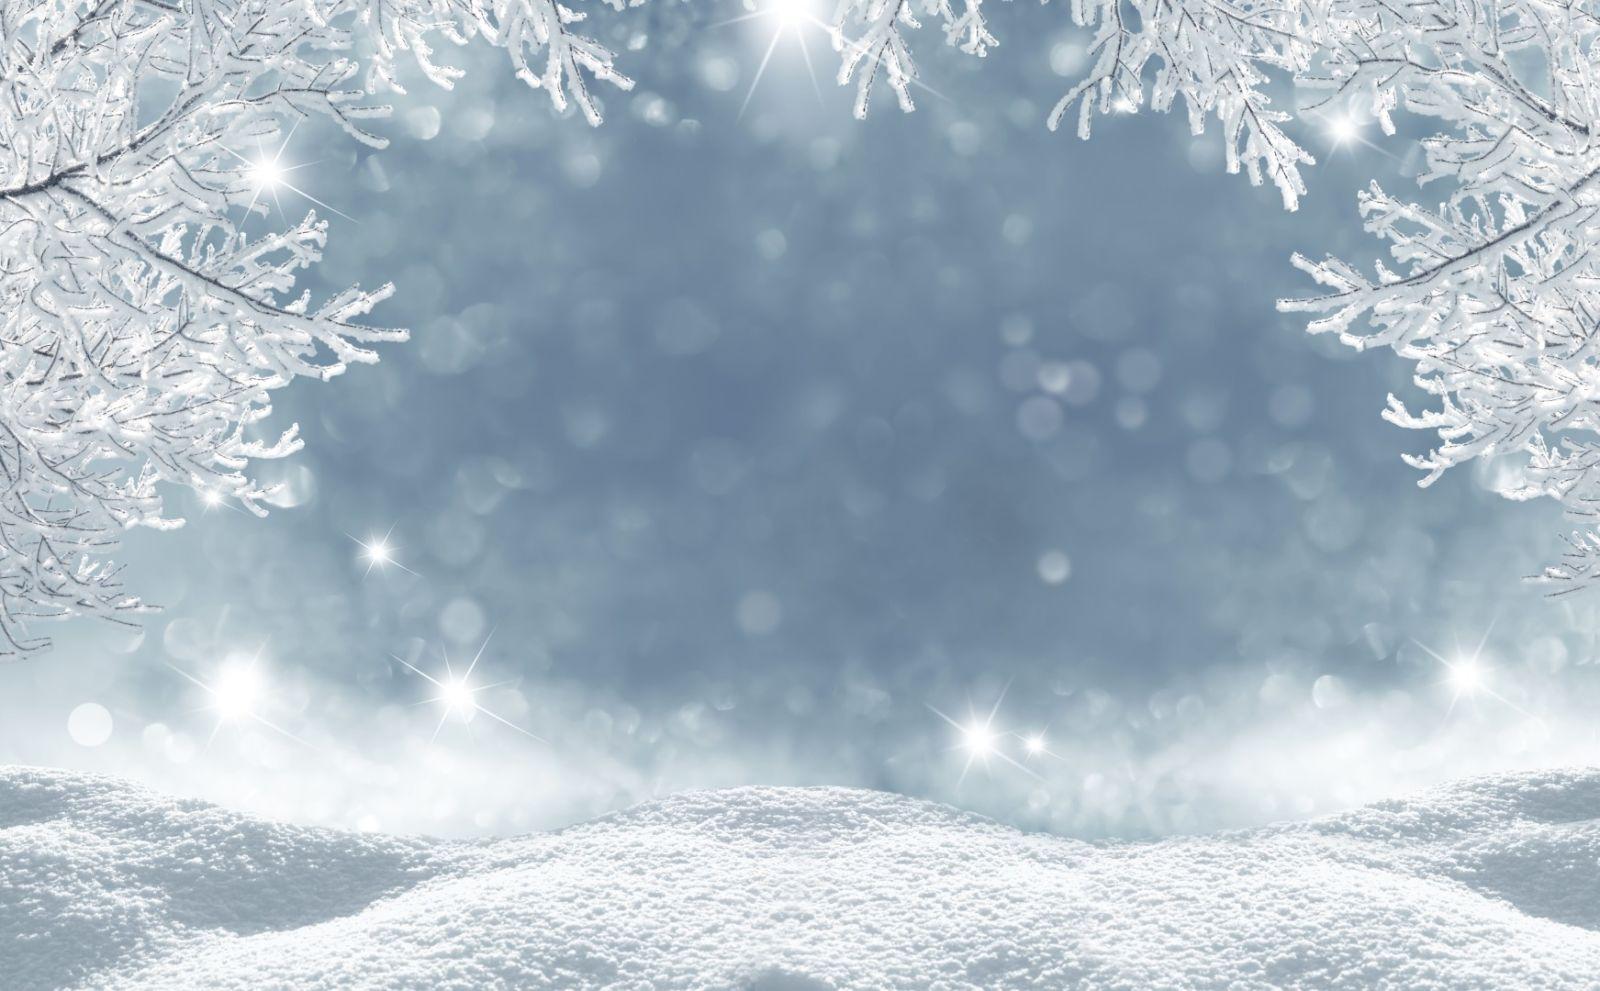 Wallpaper Hd Portrait Orientation Winter Dream Meaning Idre Am Dream Dictionary